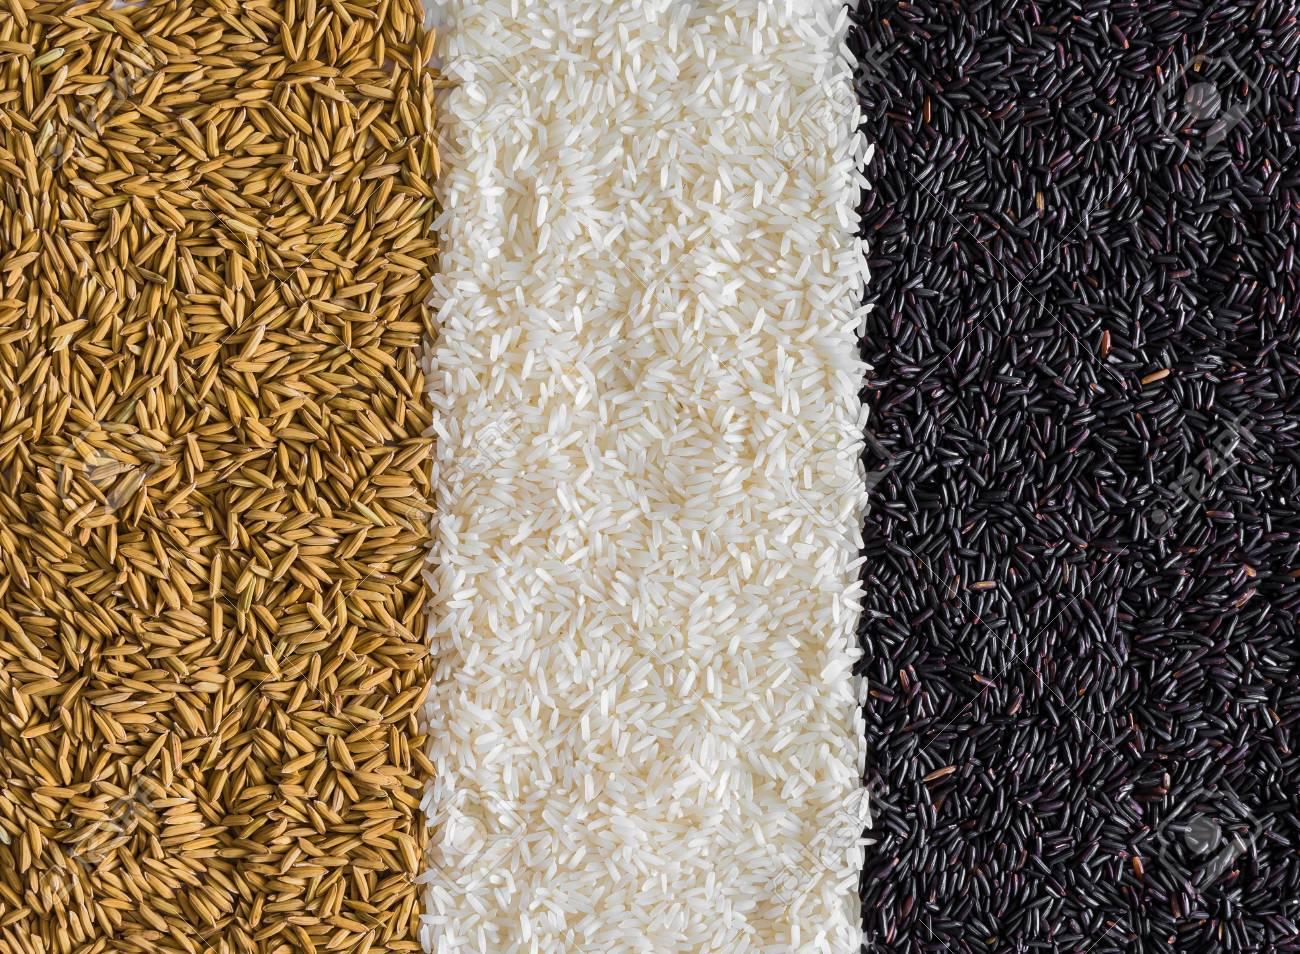 Food background with three rows of rice varieties : brown rice, black rice, white (jasmine) rice - 35911652